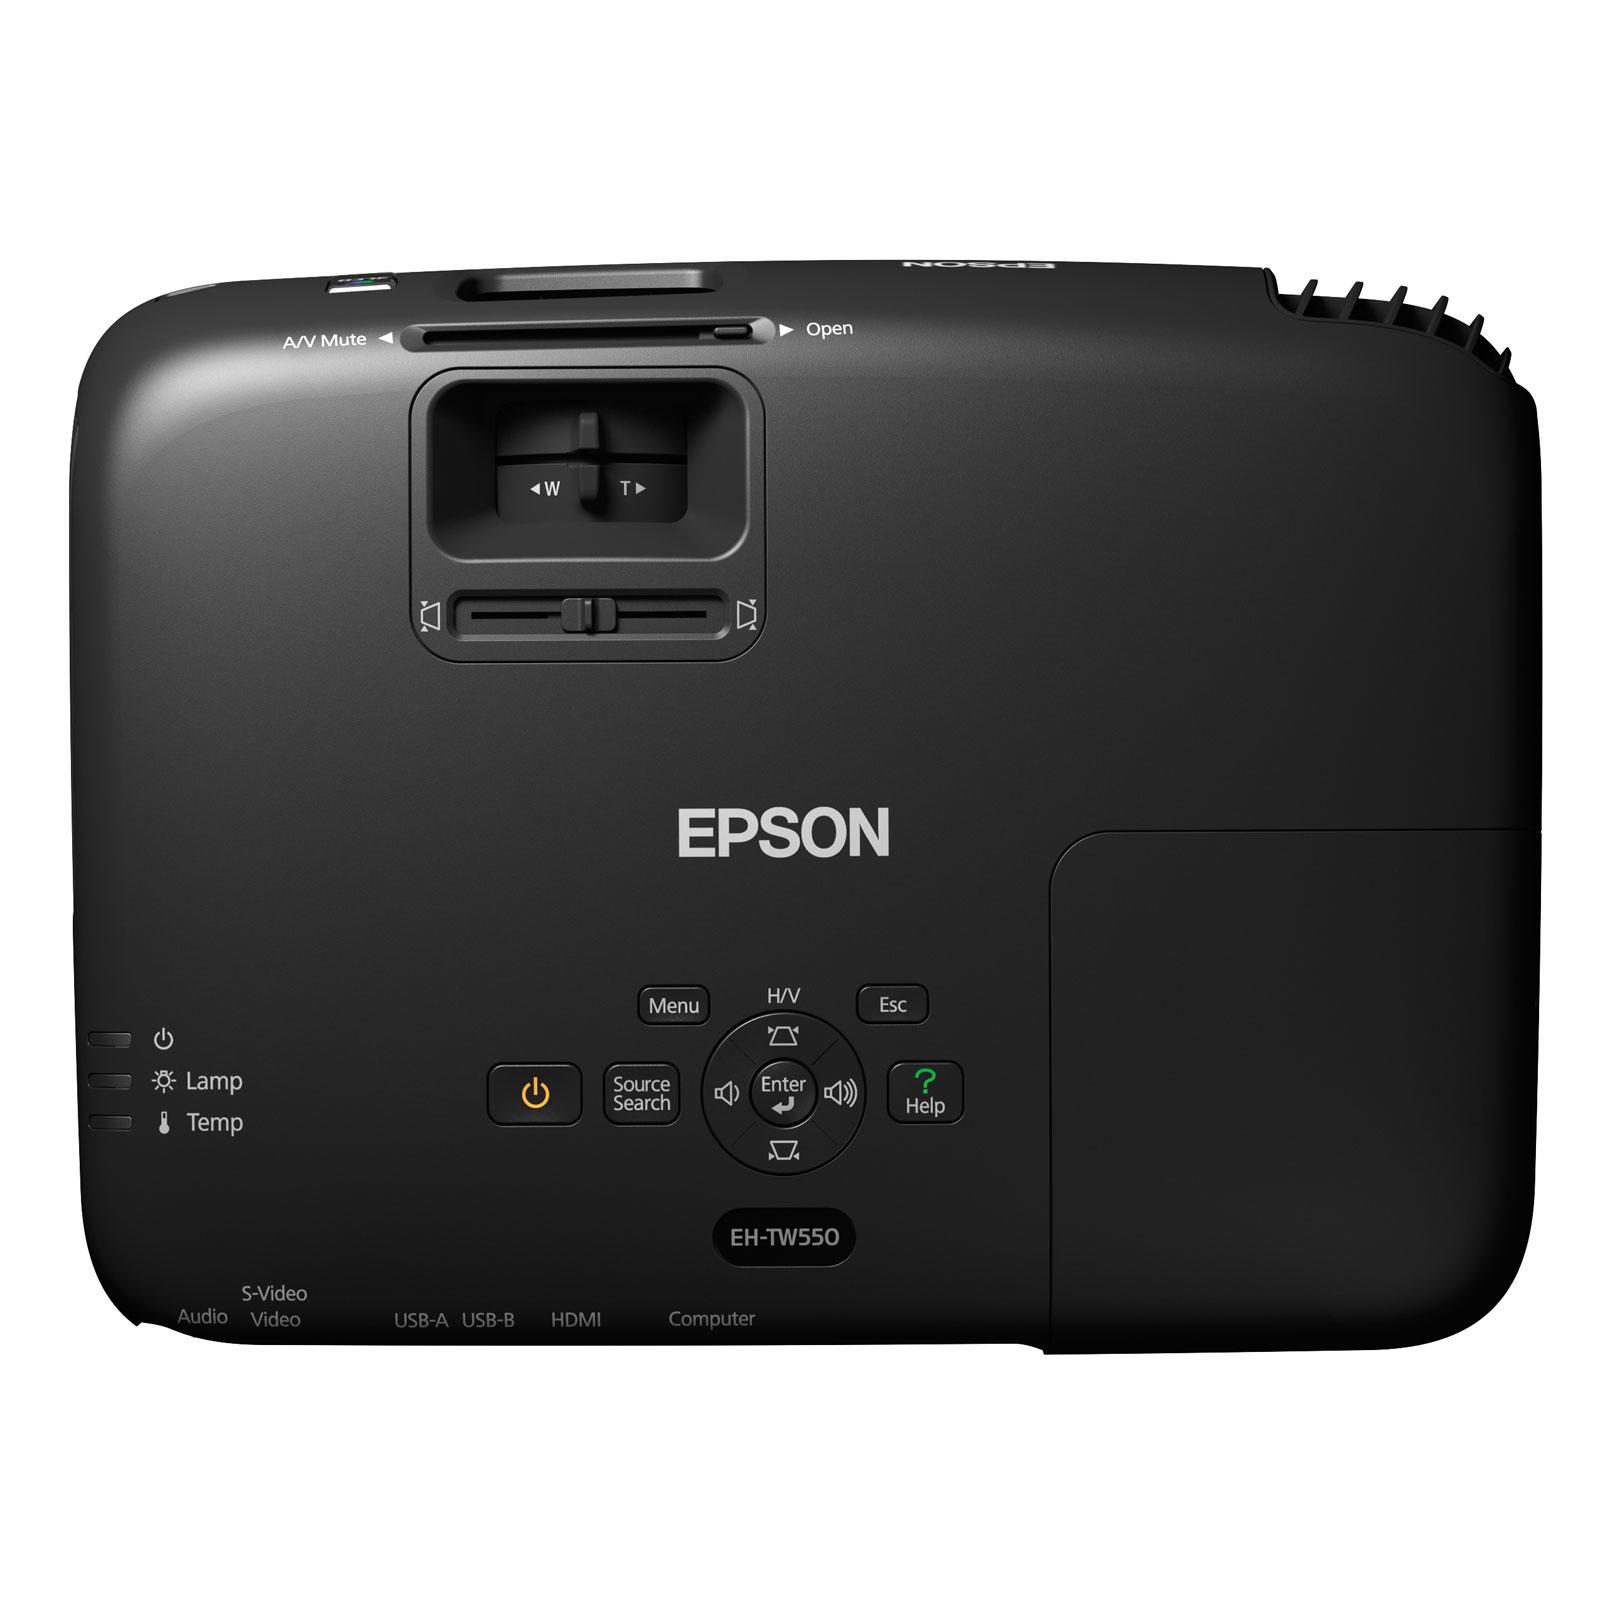 Videoprojecteur LCD 3D HD Epson EH-TW550